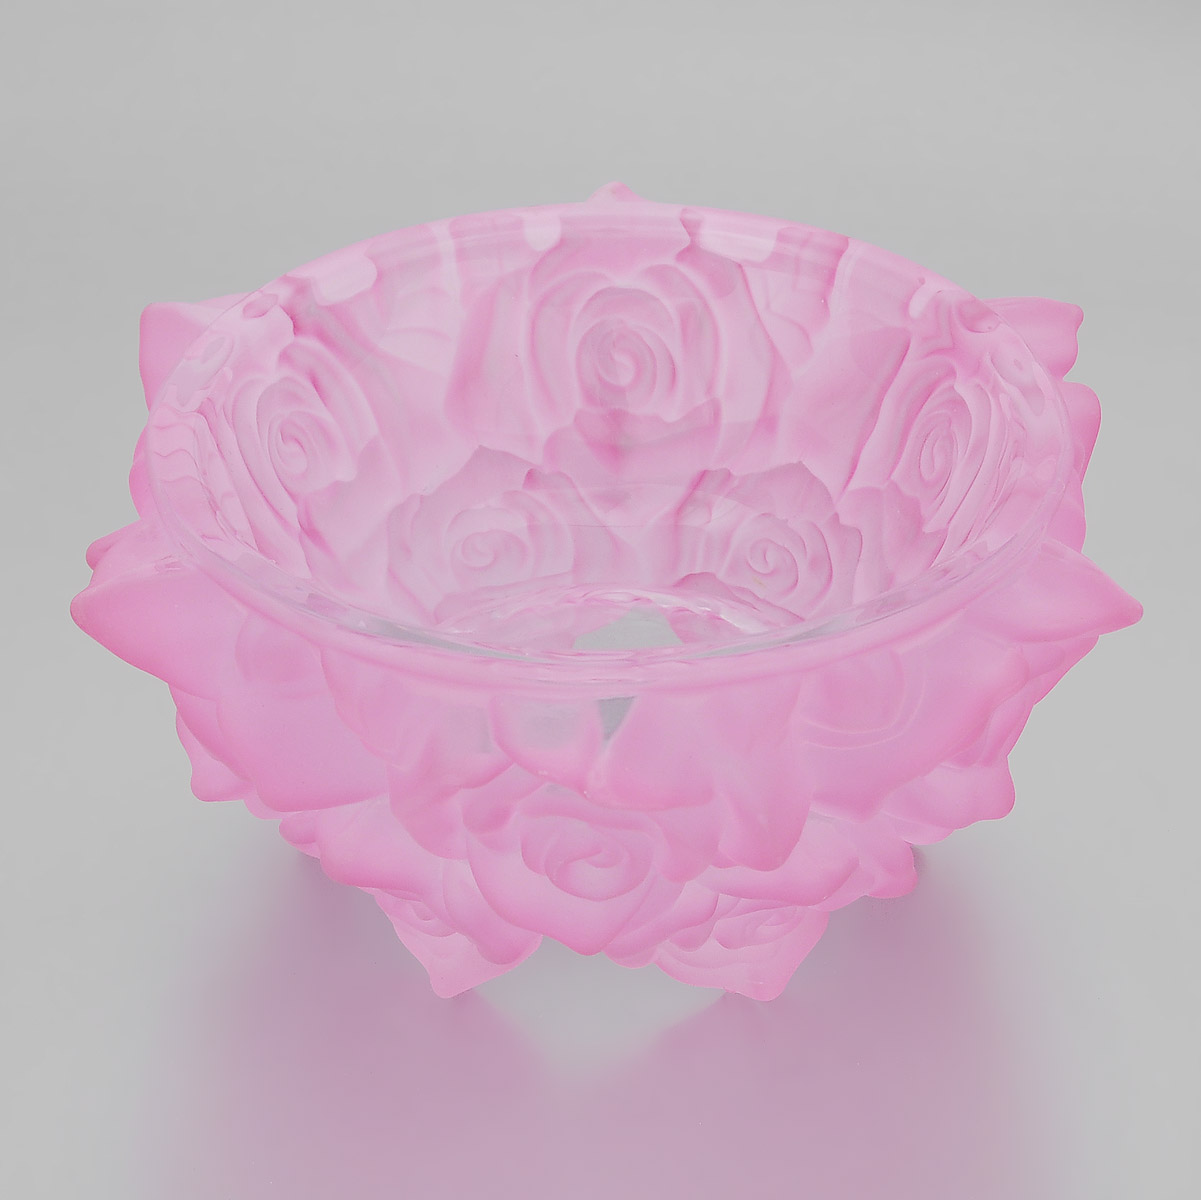 Подсвечник Crystalite Bohemia Роза, цвет: розовый, диаметр 16,5 см